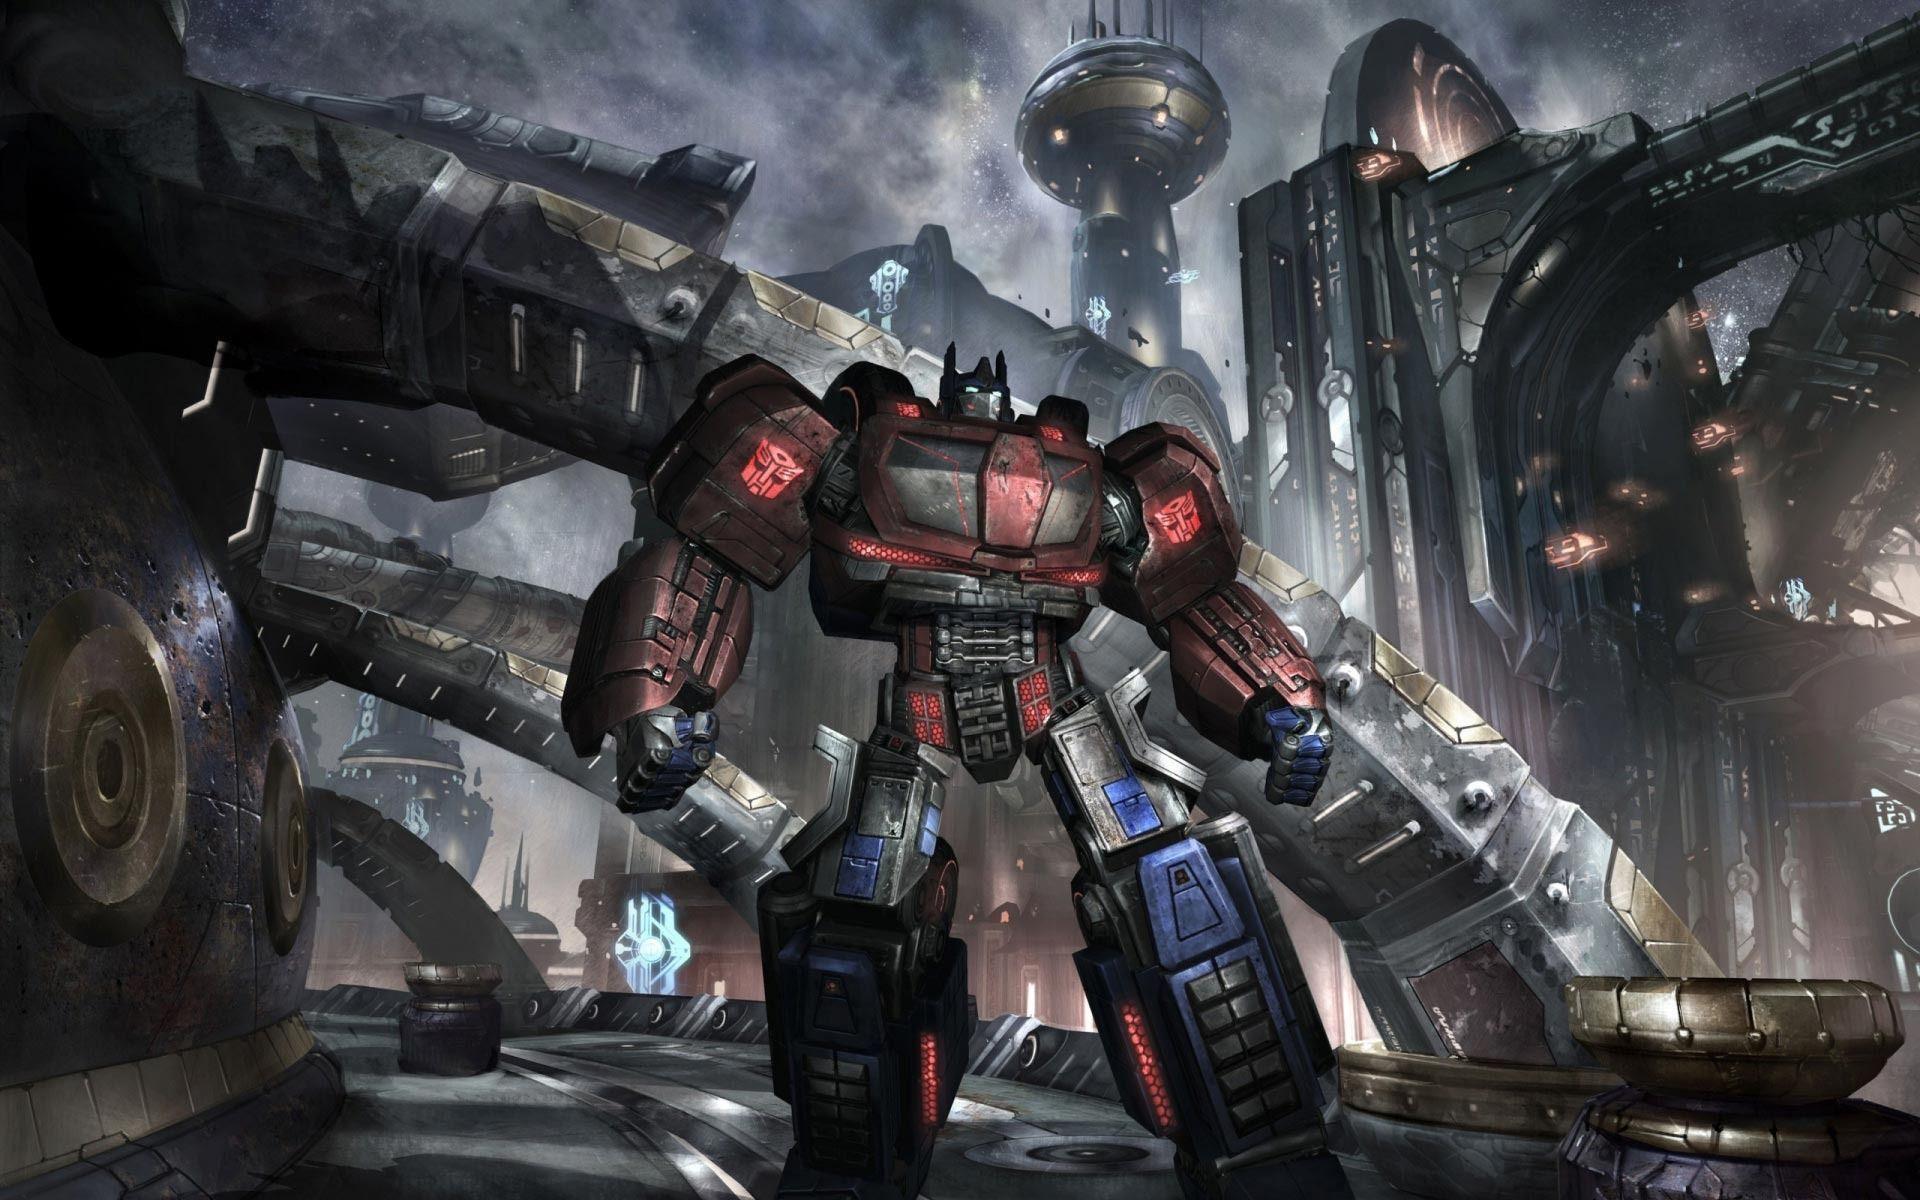 Transformers Fall Of Cybertron Wallpaper Hd Transformers Cybertron Wallpapers Wallpaper Cave